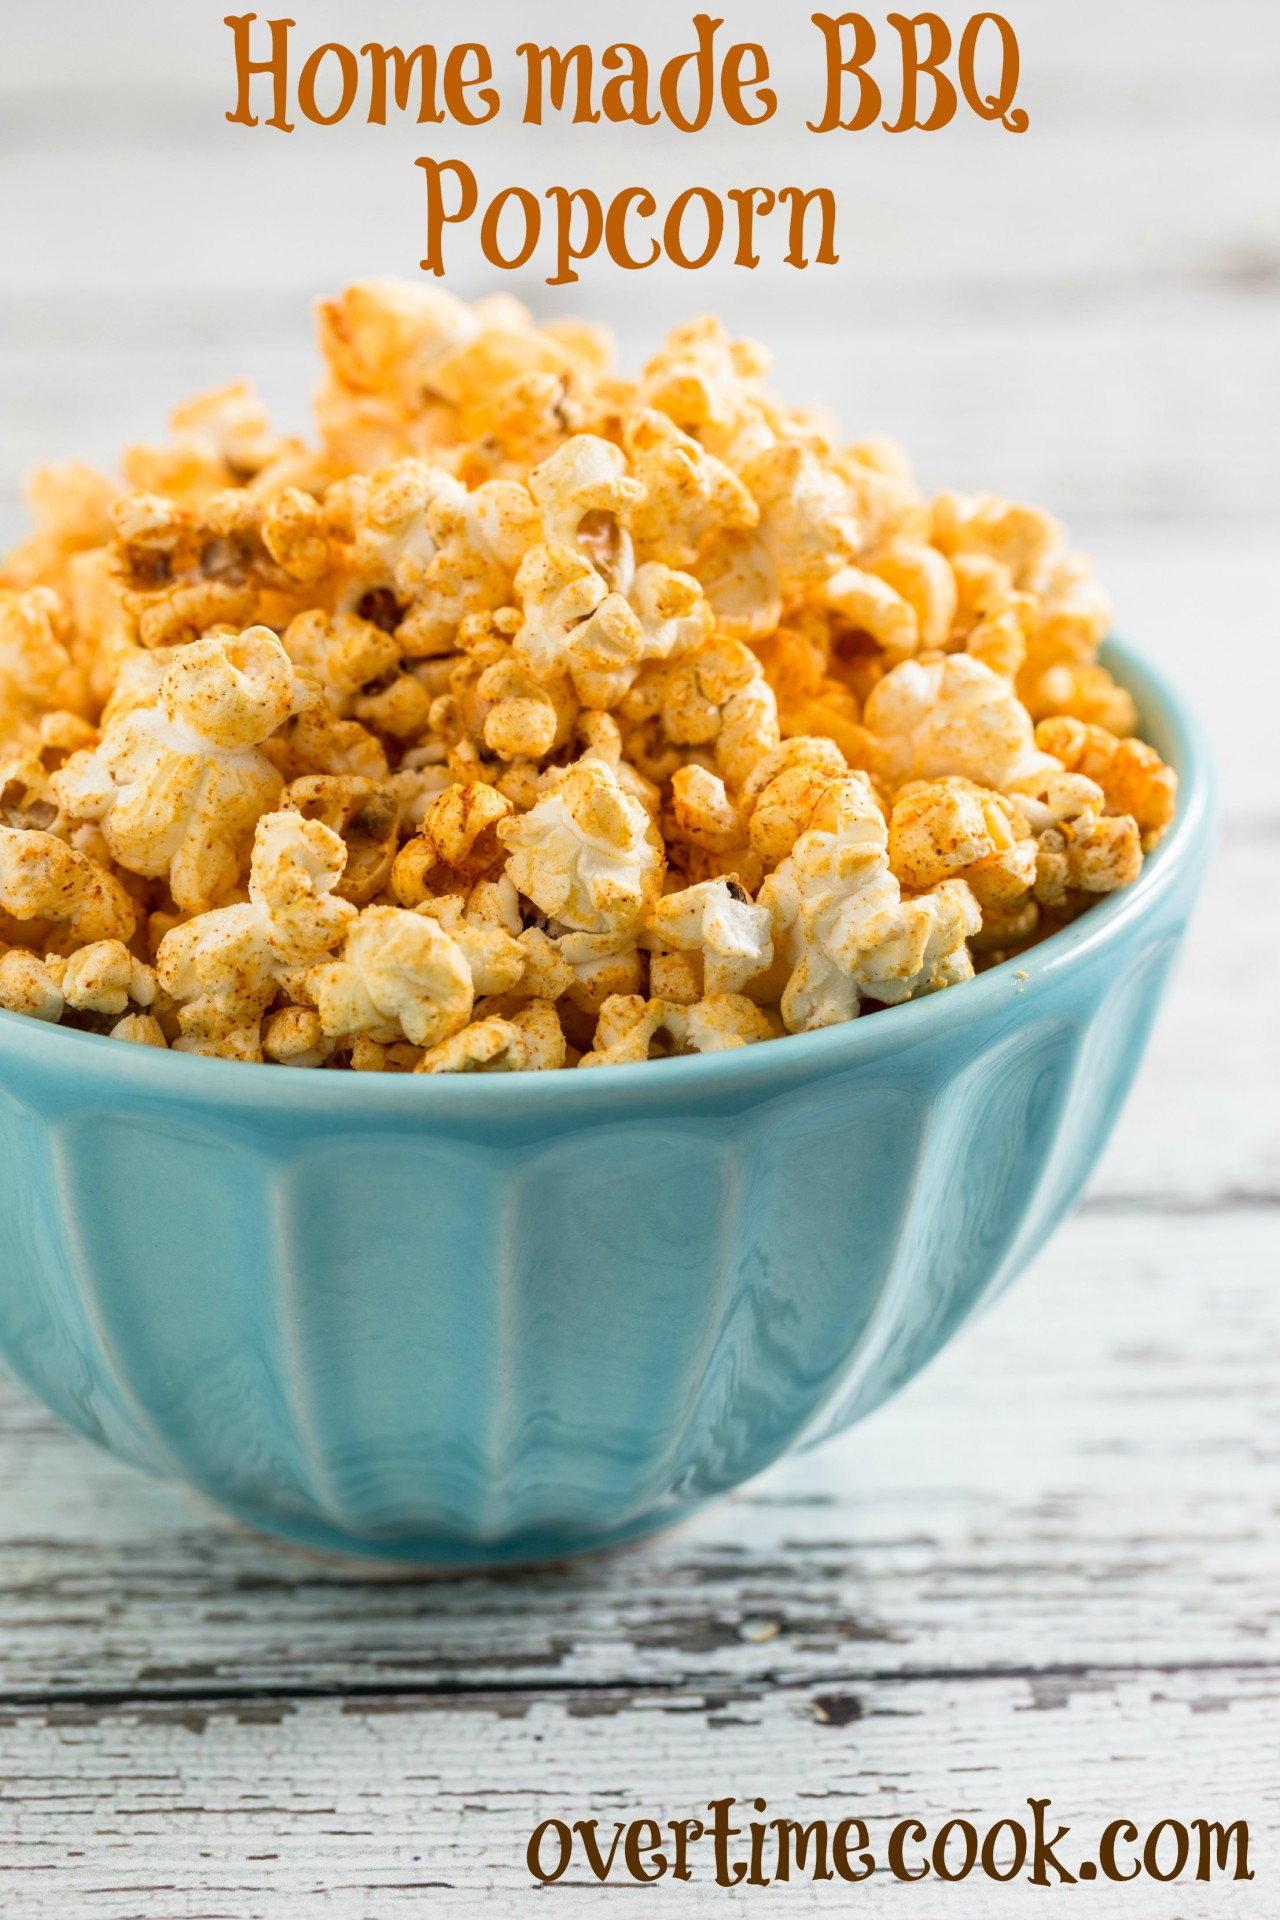 ... popcorn bbq popcorn bbq popcorn cakes backyard bbq popcorn sampler bbq